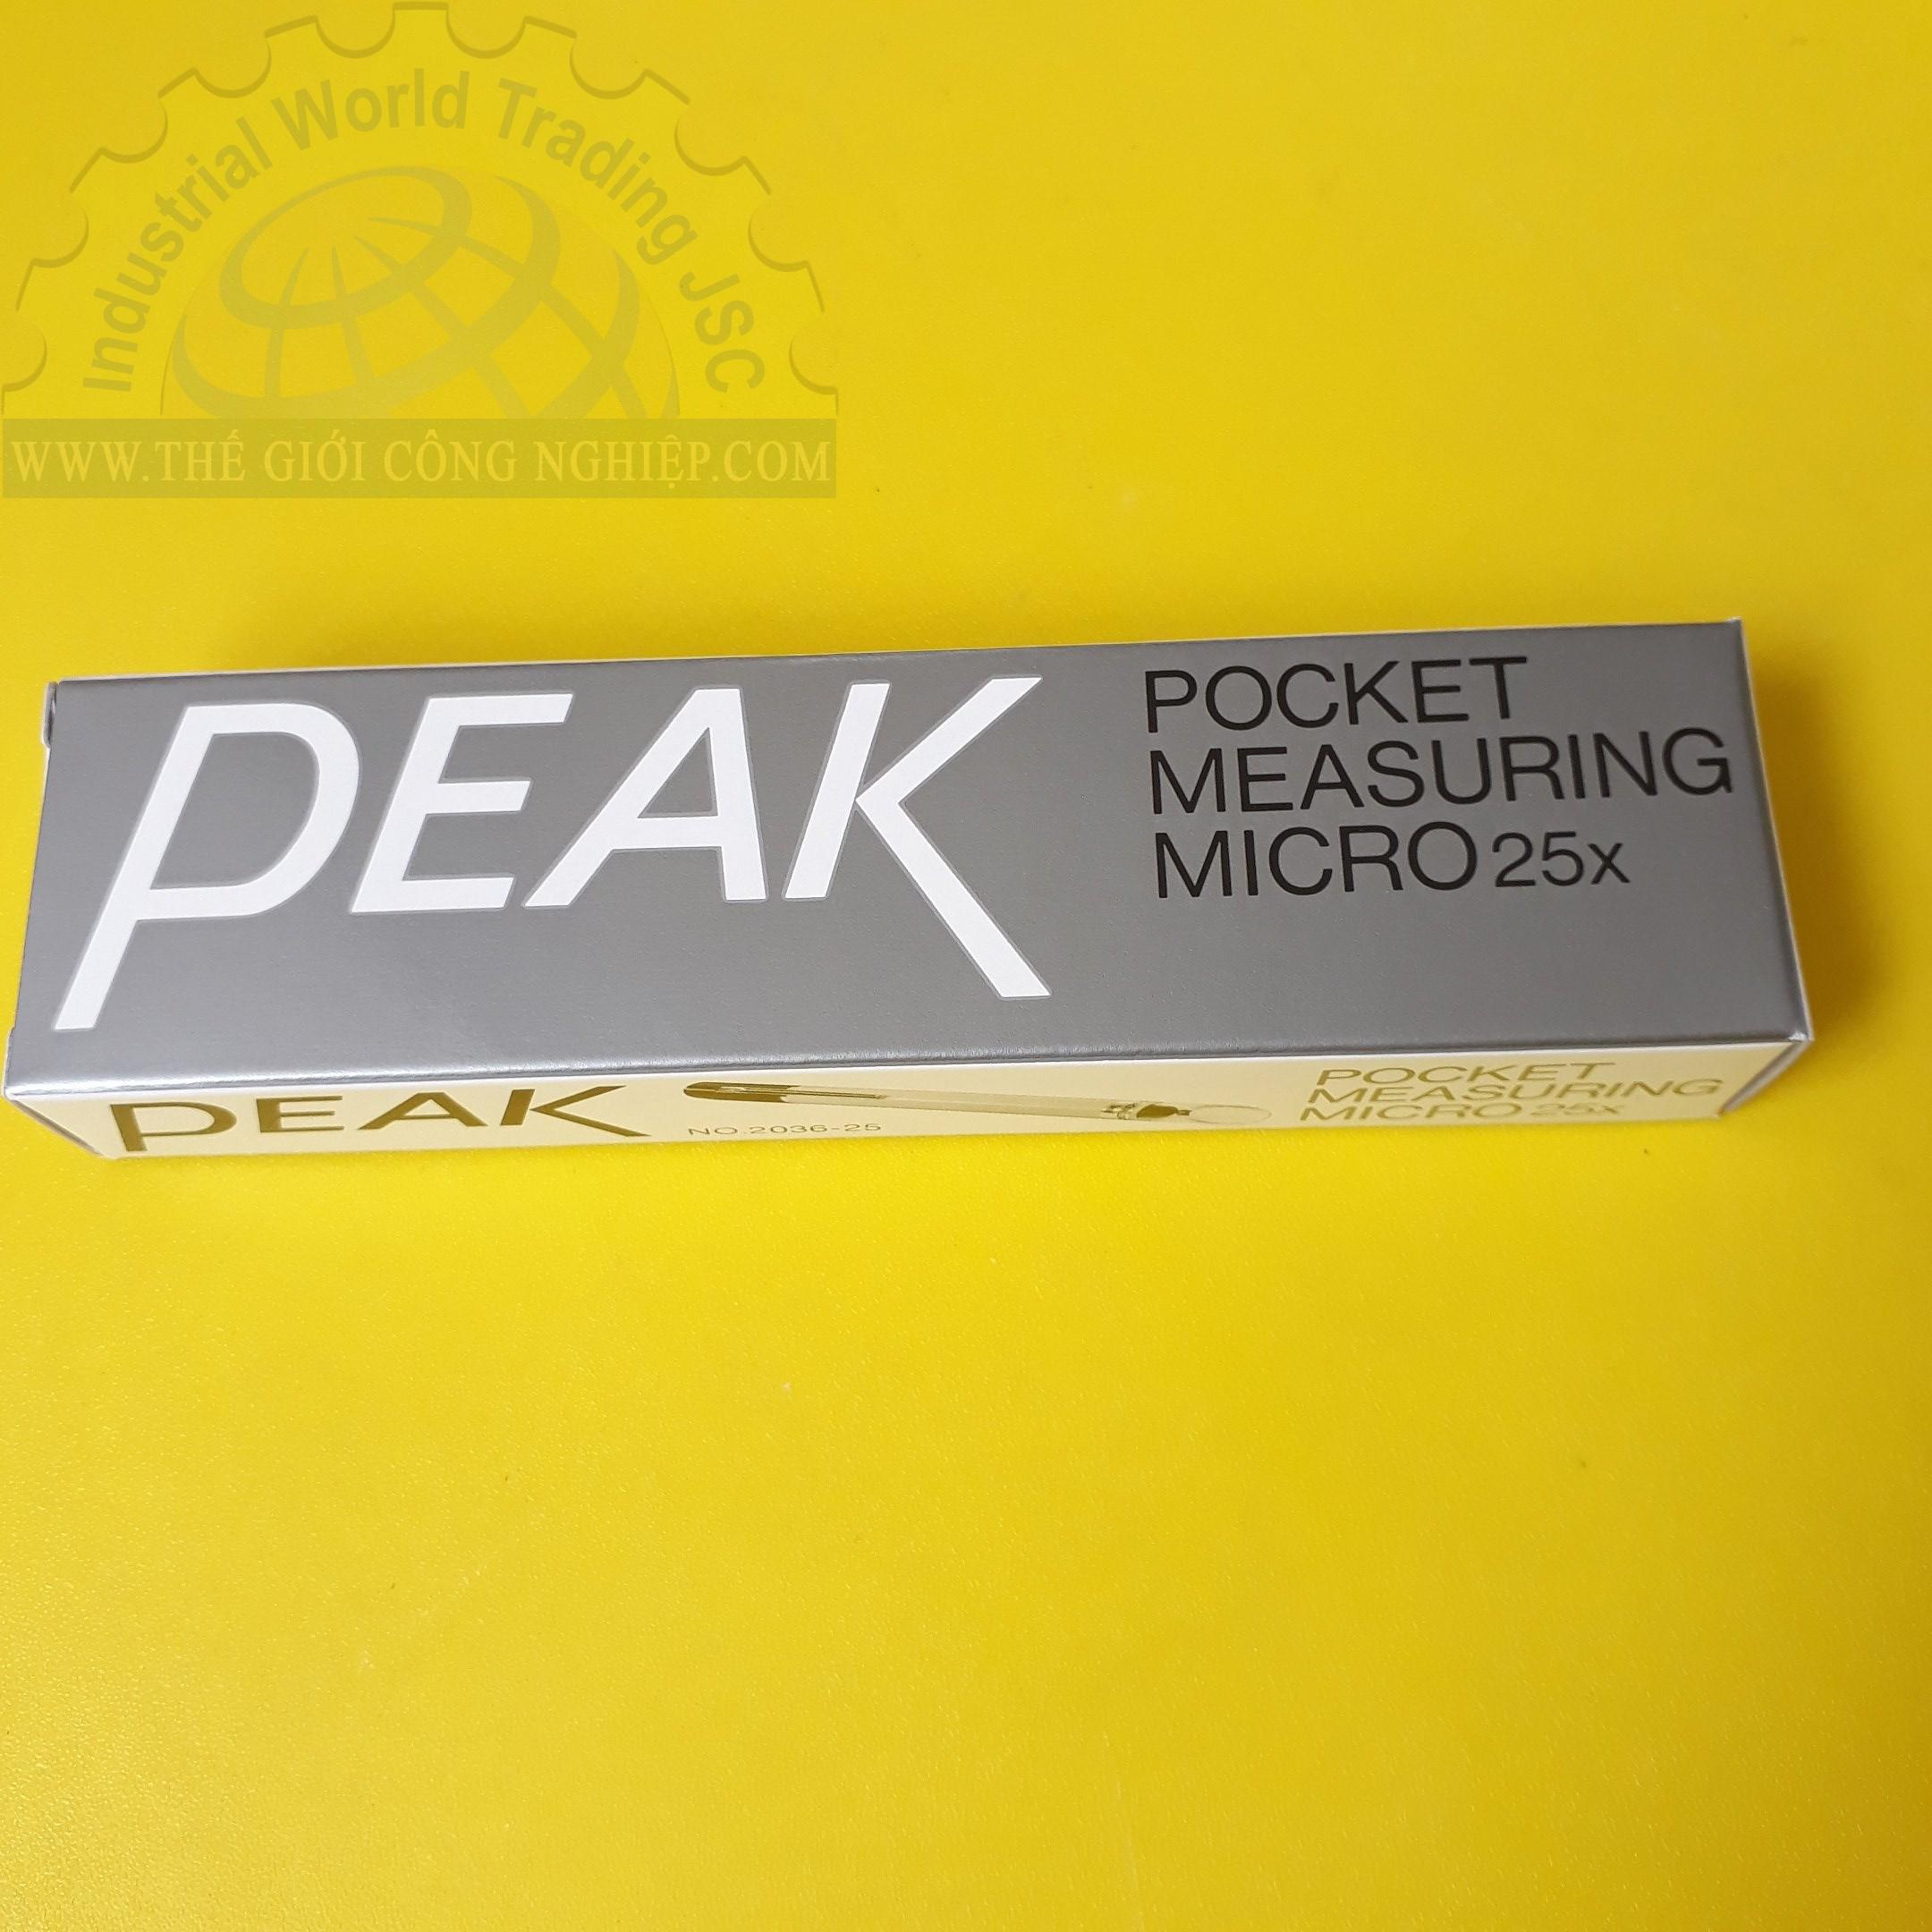 Pocket Measuring Microscope 2036-25 PEAK